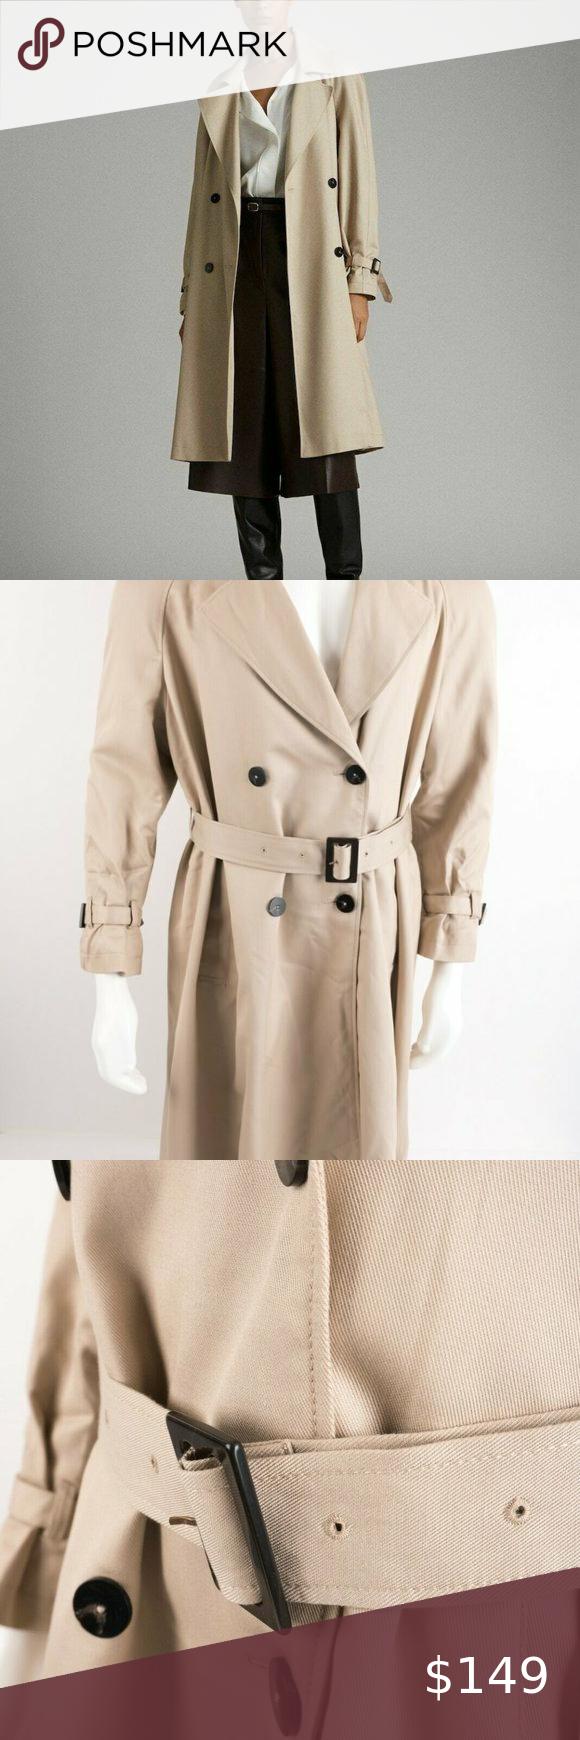 Massimo Dutti Womens Trench Coat Jacket L Relaxed Trench Coats Women Trench Coat Jackets Trench Coat